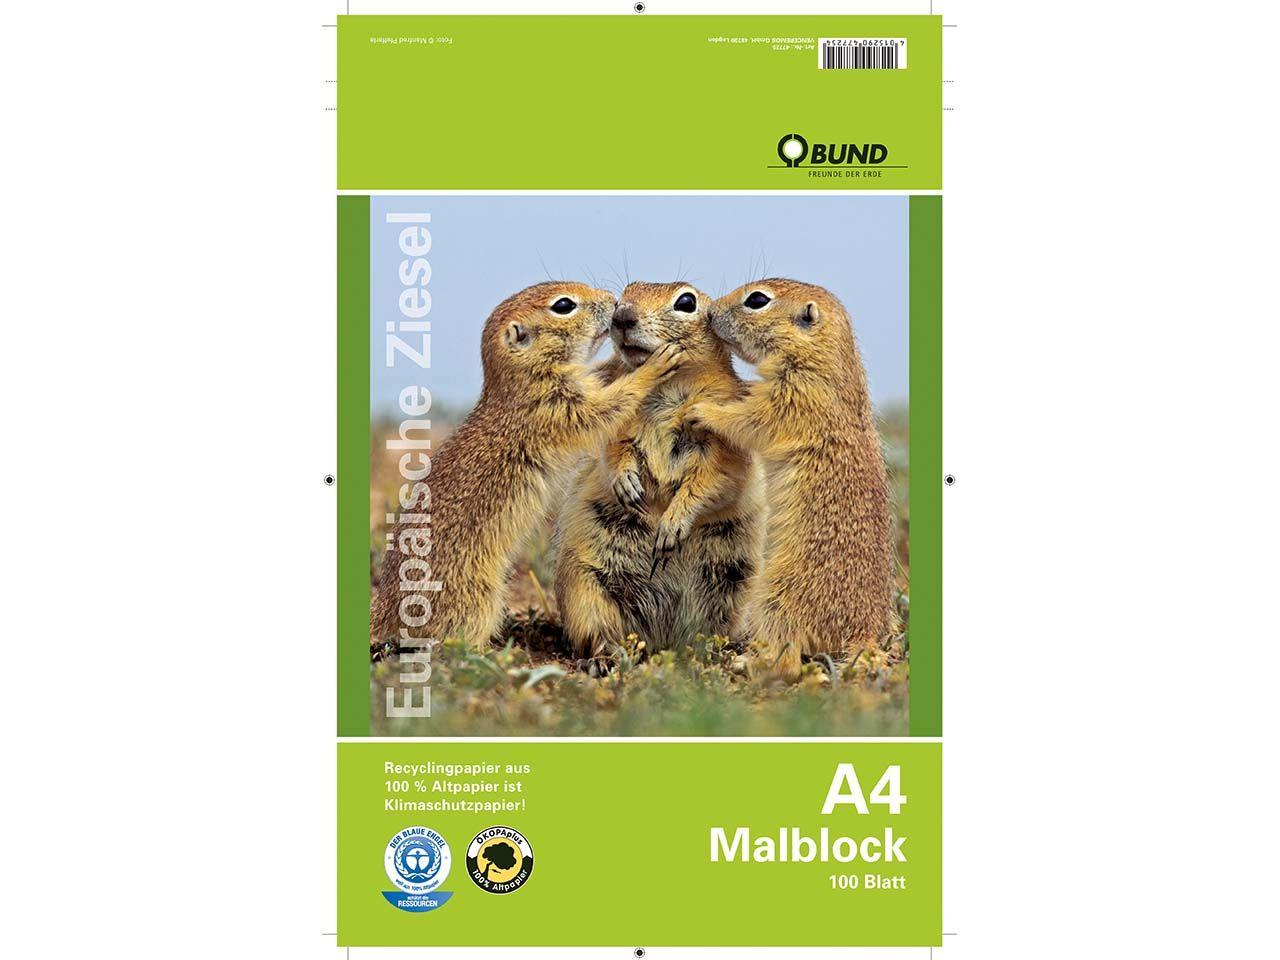 BUND Malblock A4, 100 Blatt 47725